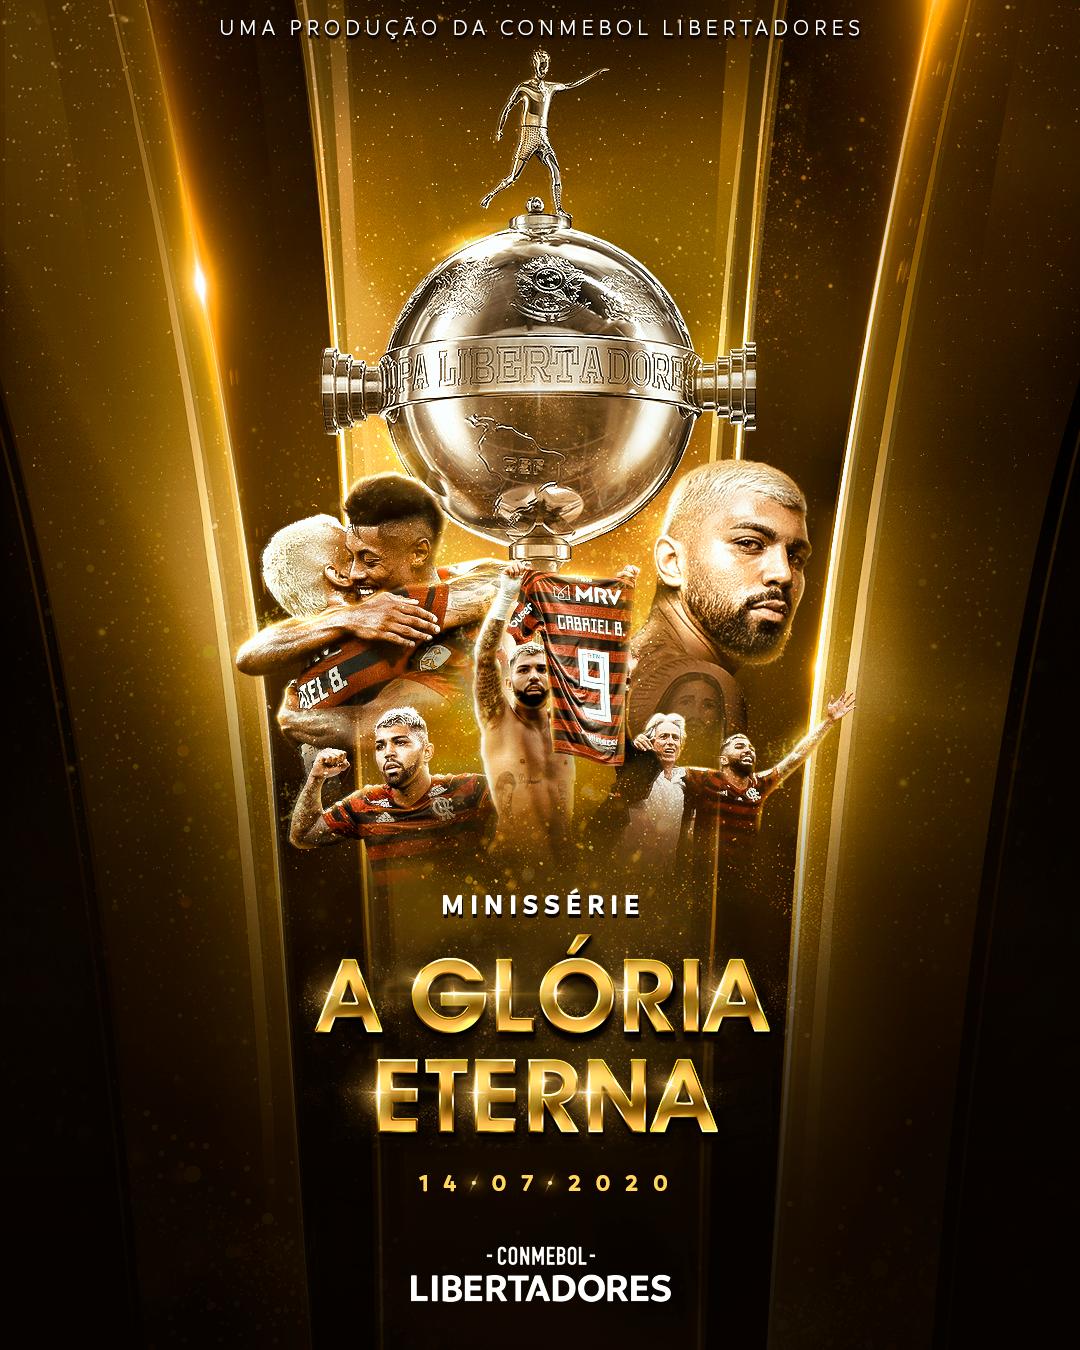 Glória Eterna poster